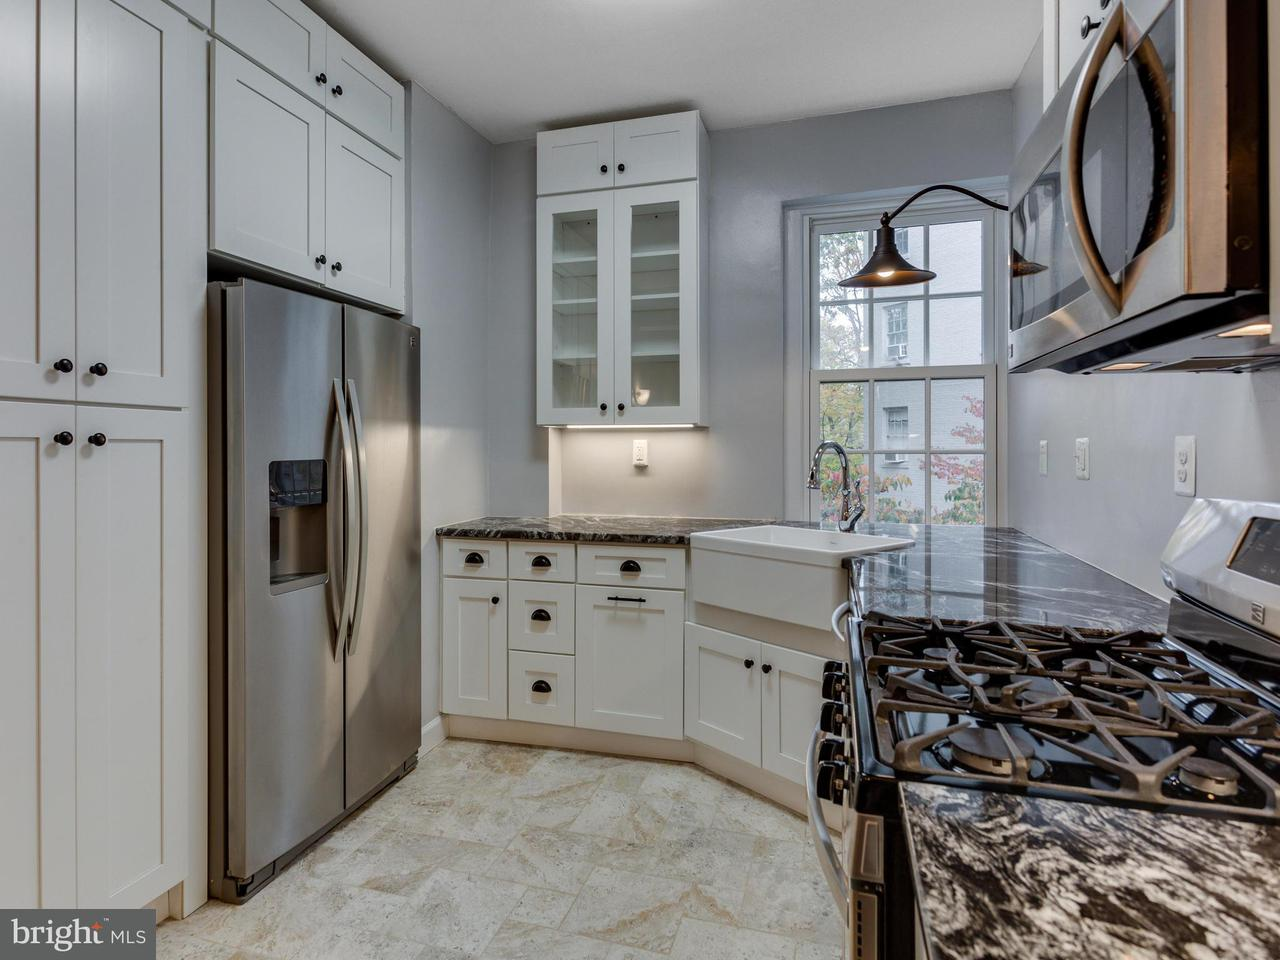 Condominium for Rent at 2737 Devonshire Pl NW #129 Washington, District Of Columbia 20008 United States